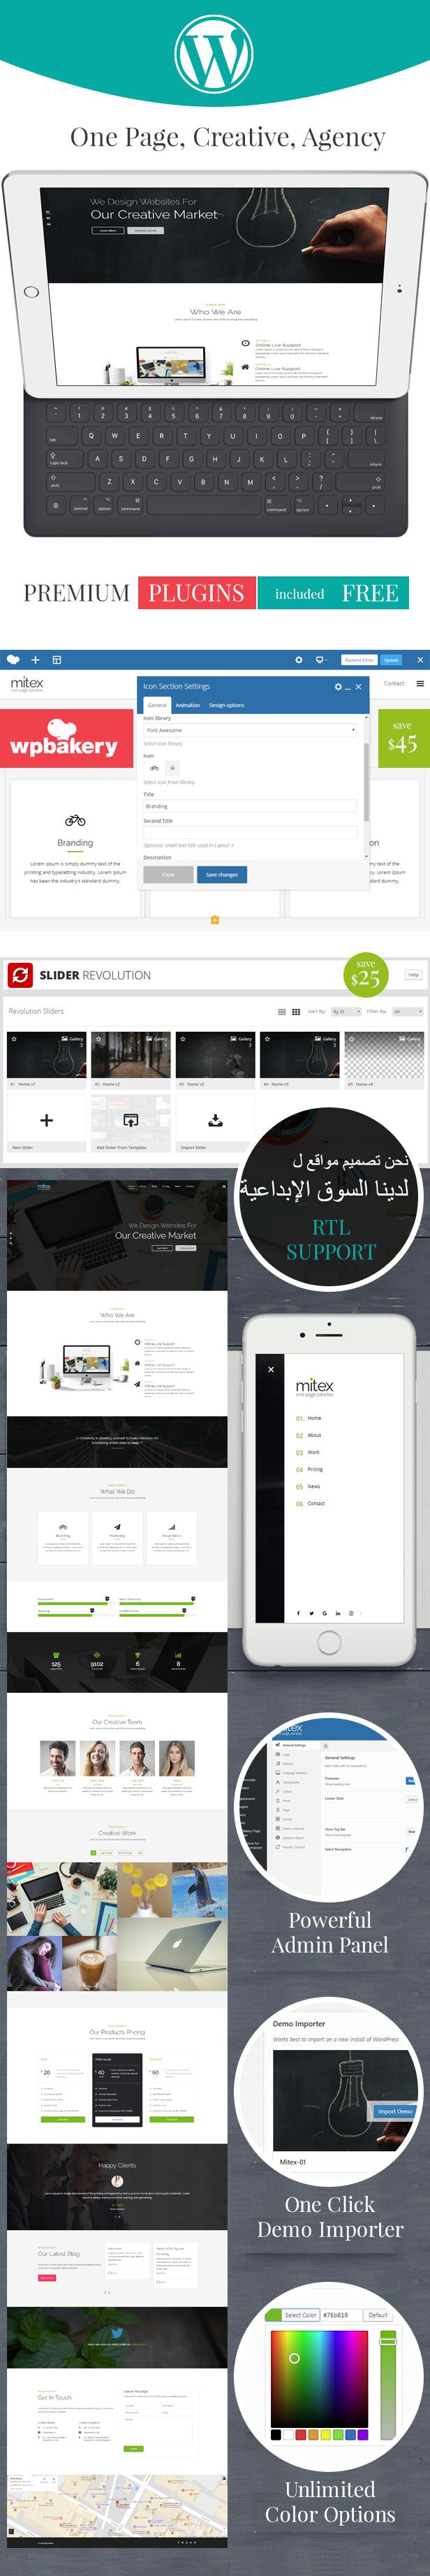 Mitex – One Page WordPress Theme, Gobase64